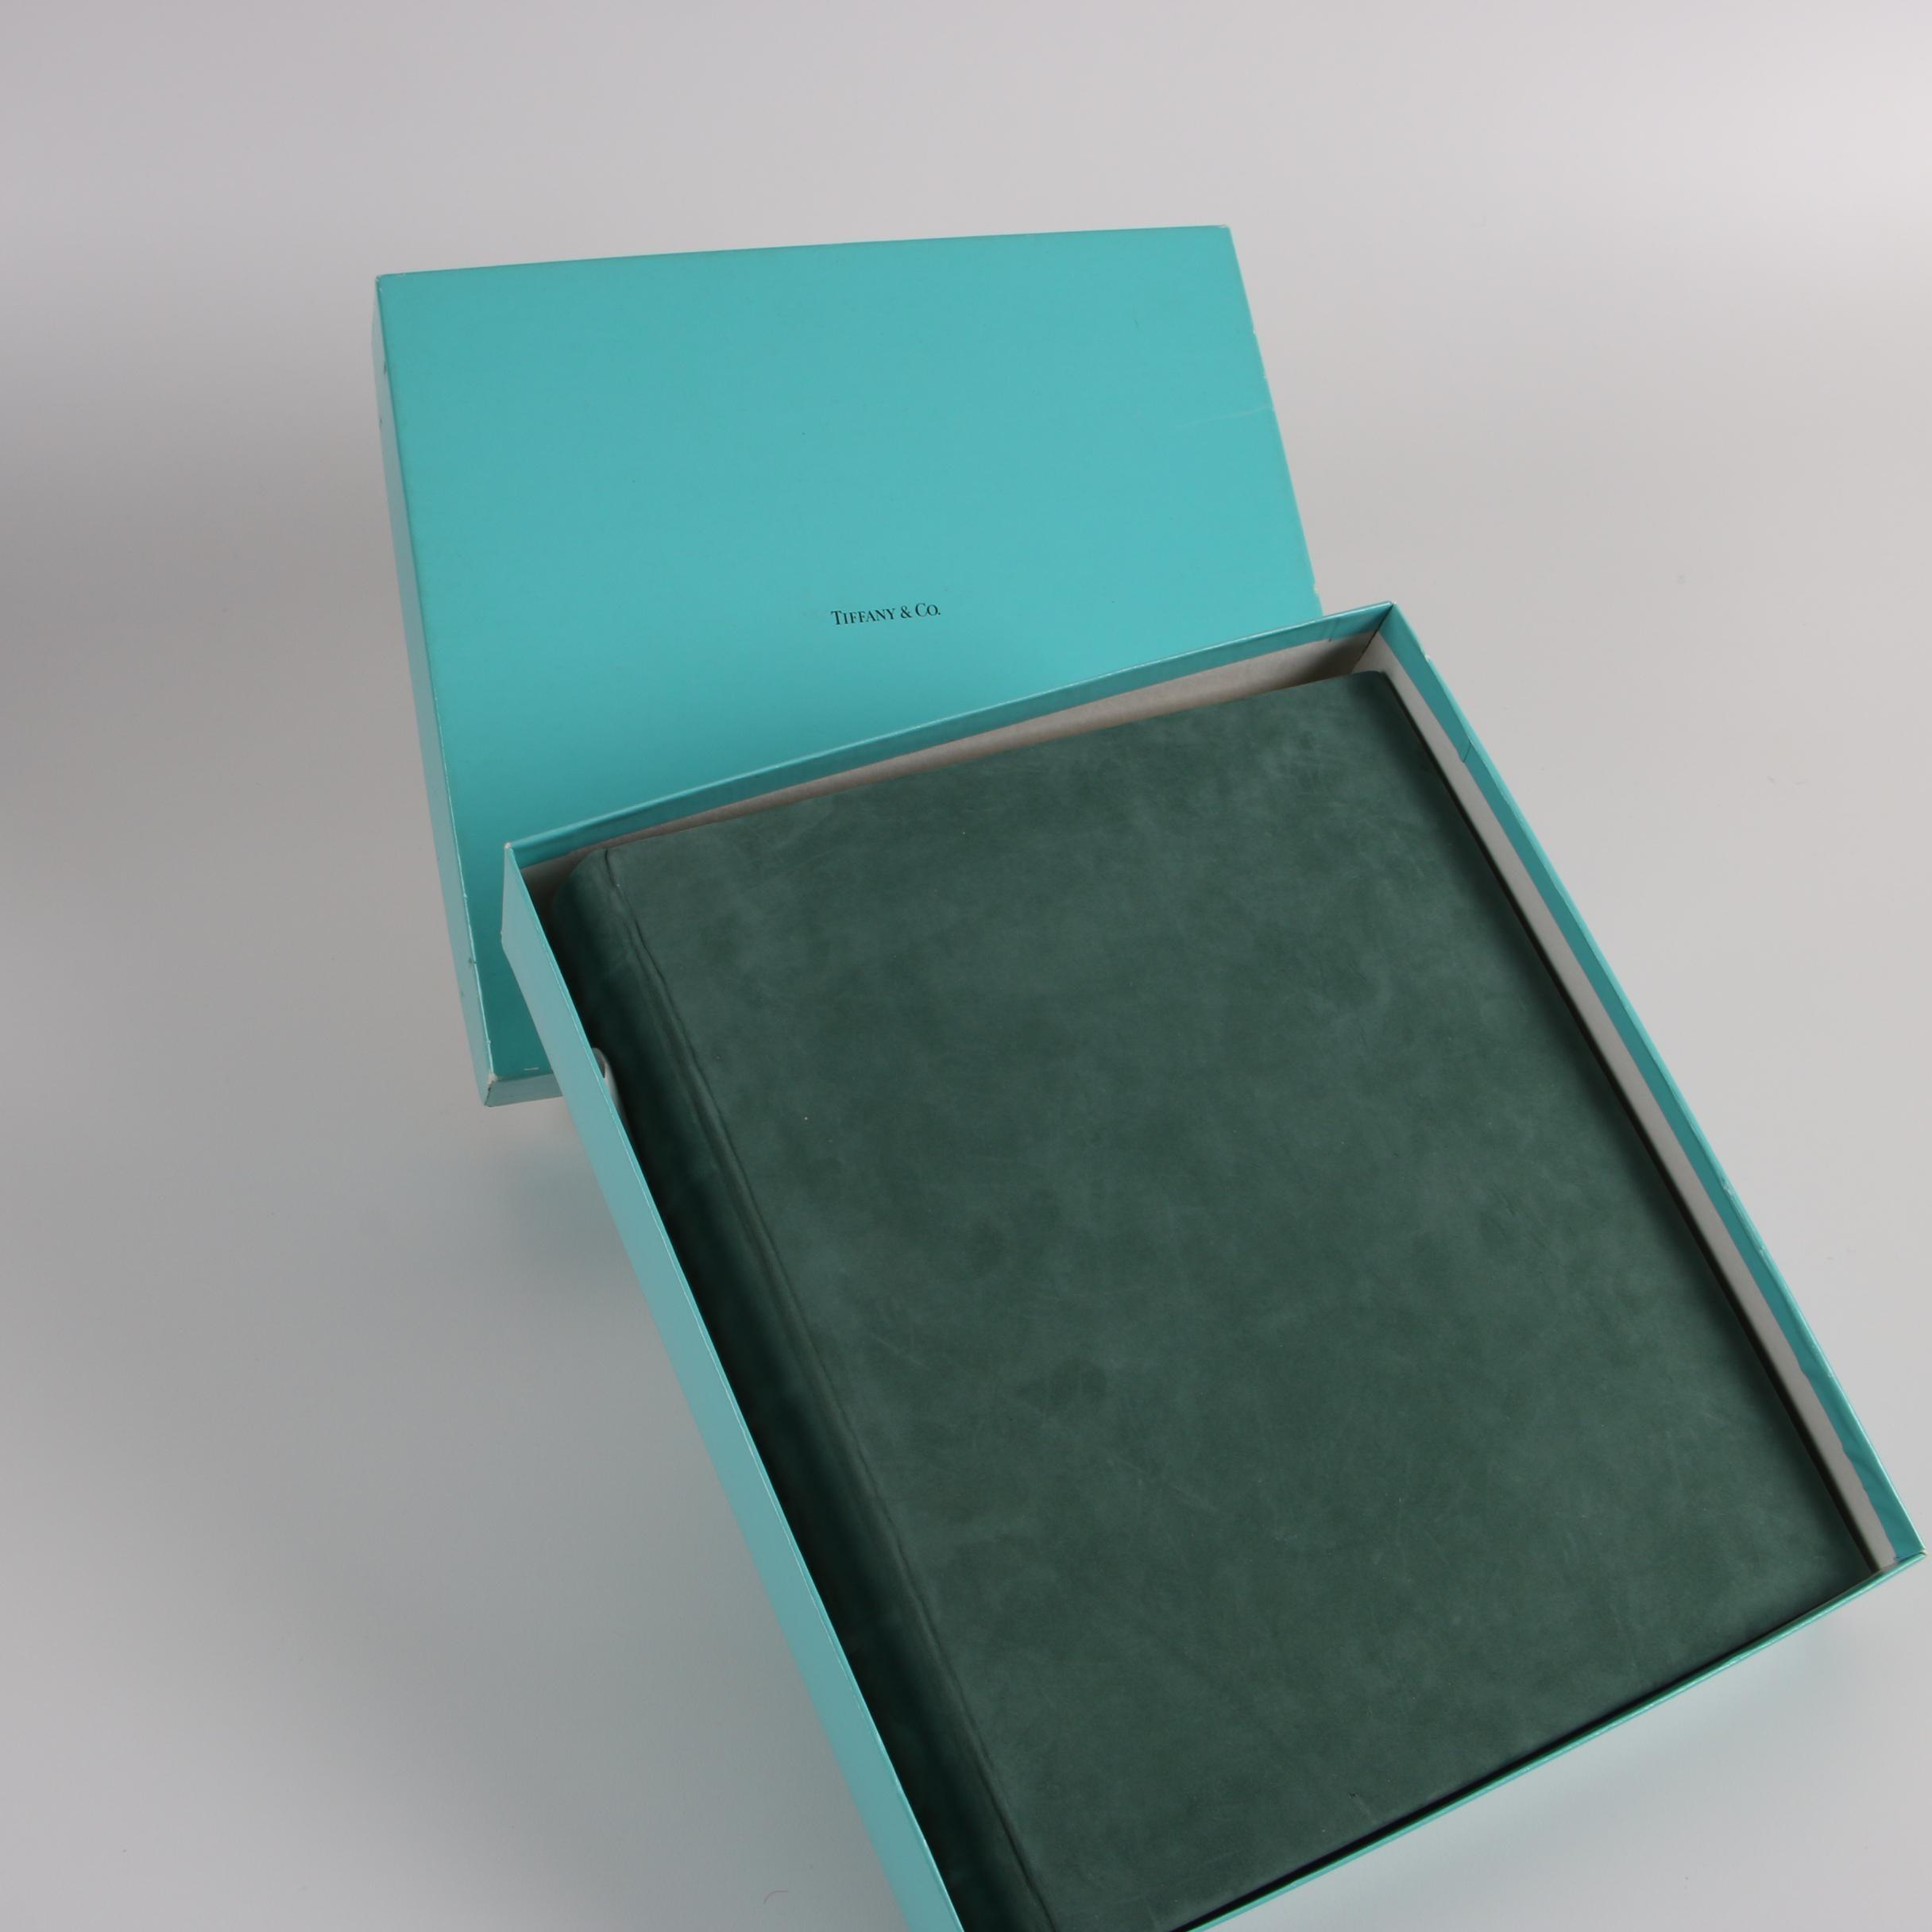 Tiffany & Co. Suede Photo Album